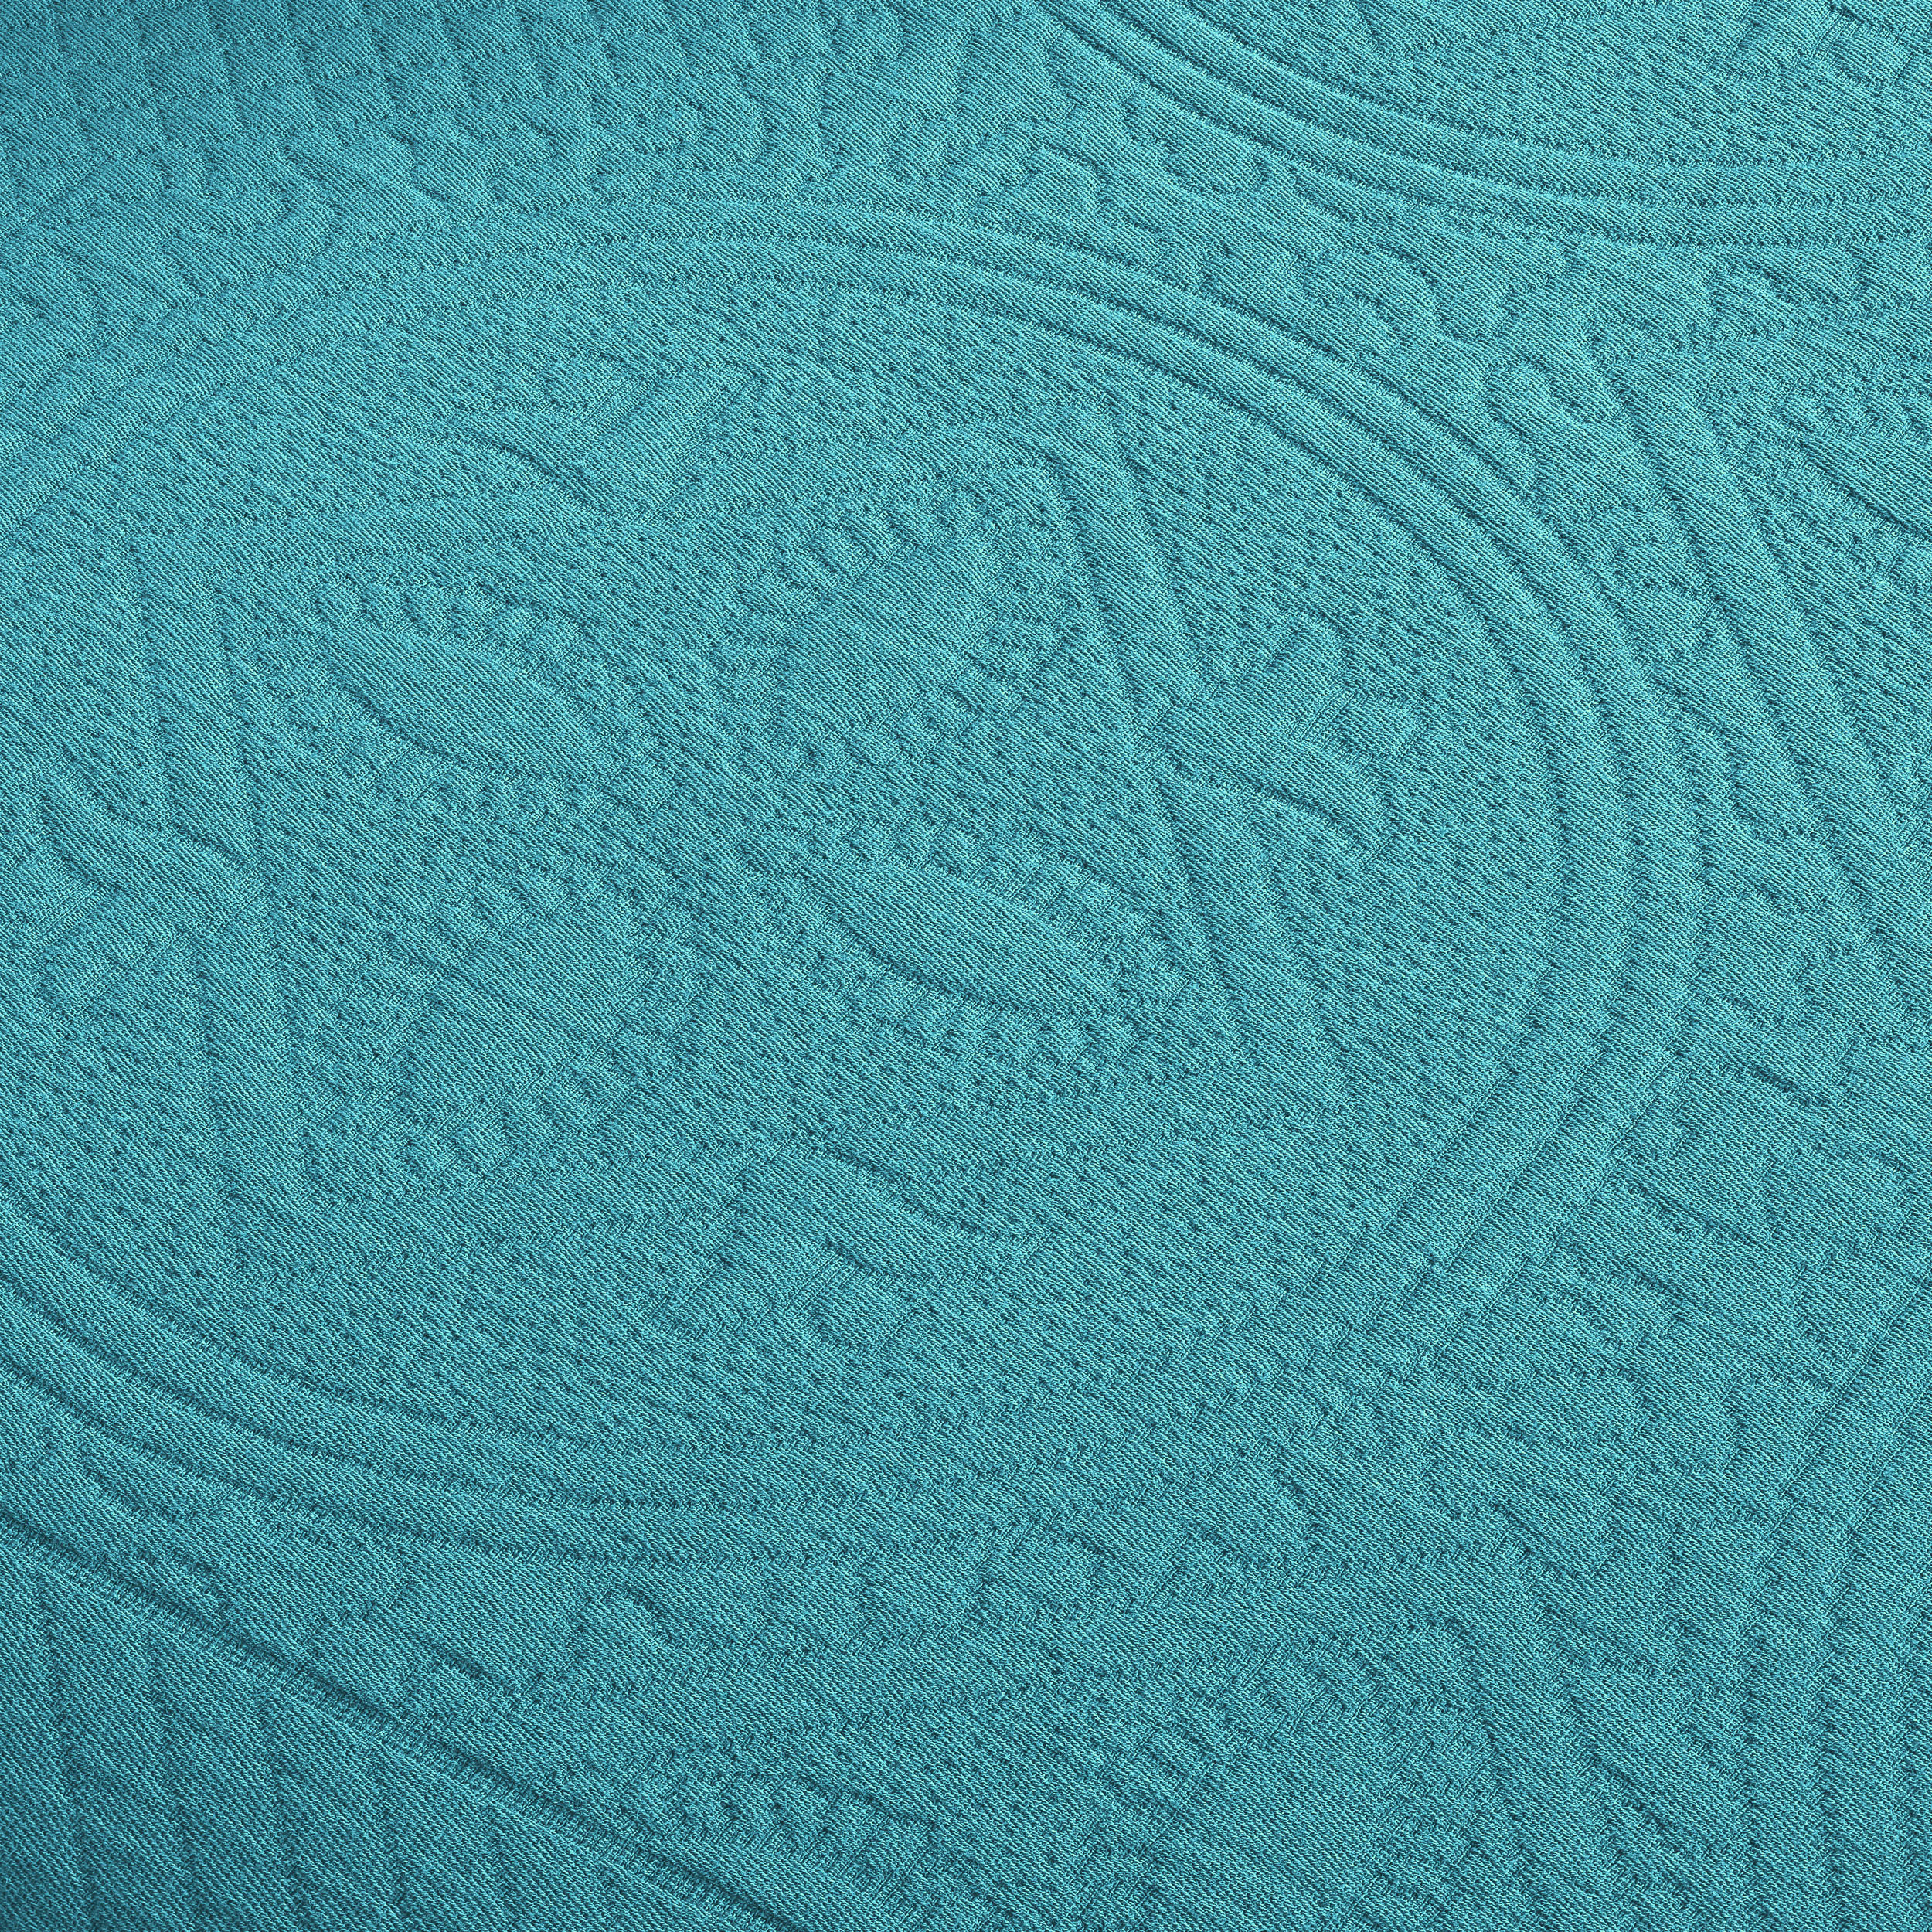 Celtic-Circle-Cotton-Jacquard-Matelasse-Scalloped-Bedspread-Set thumbnail 20